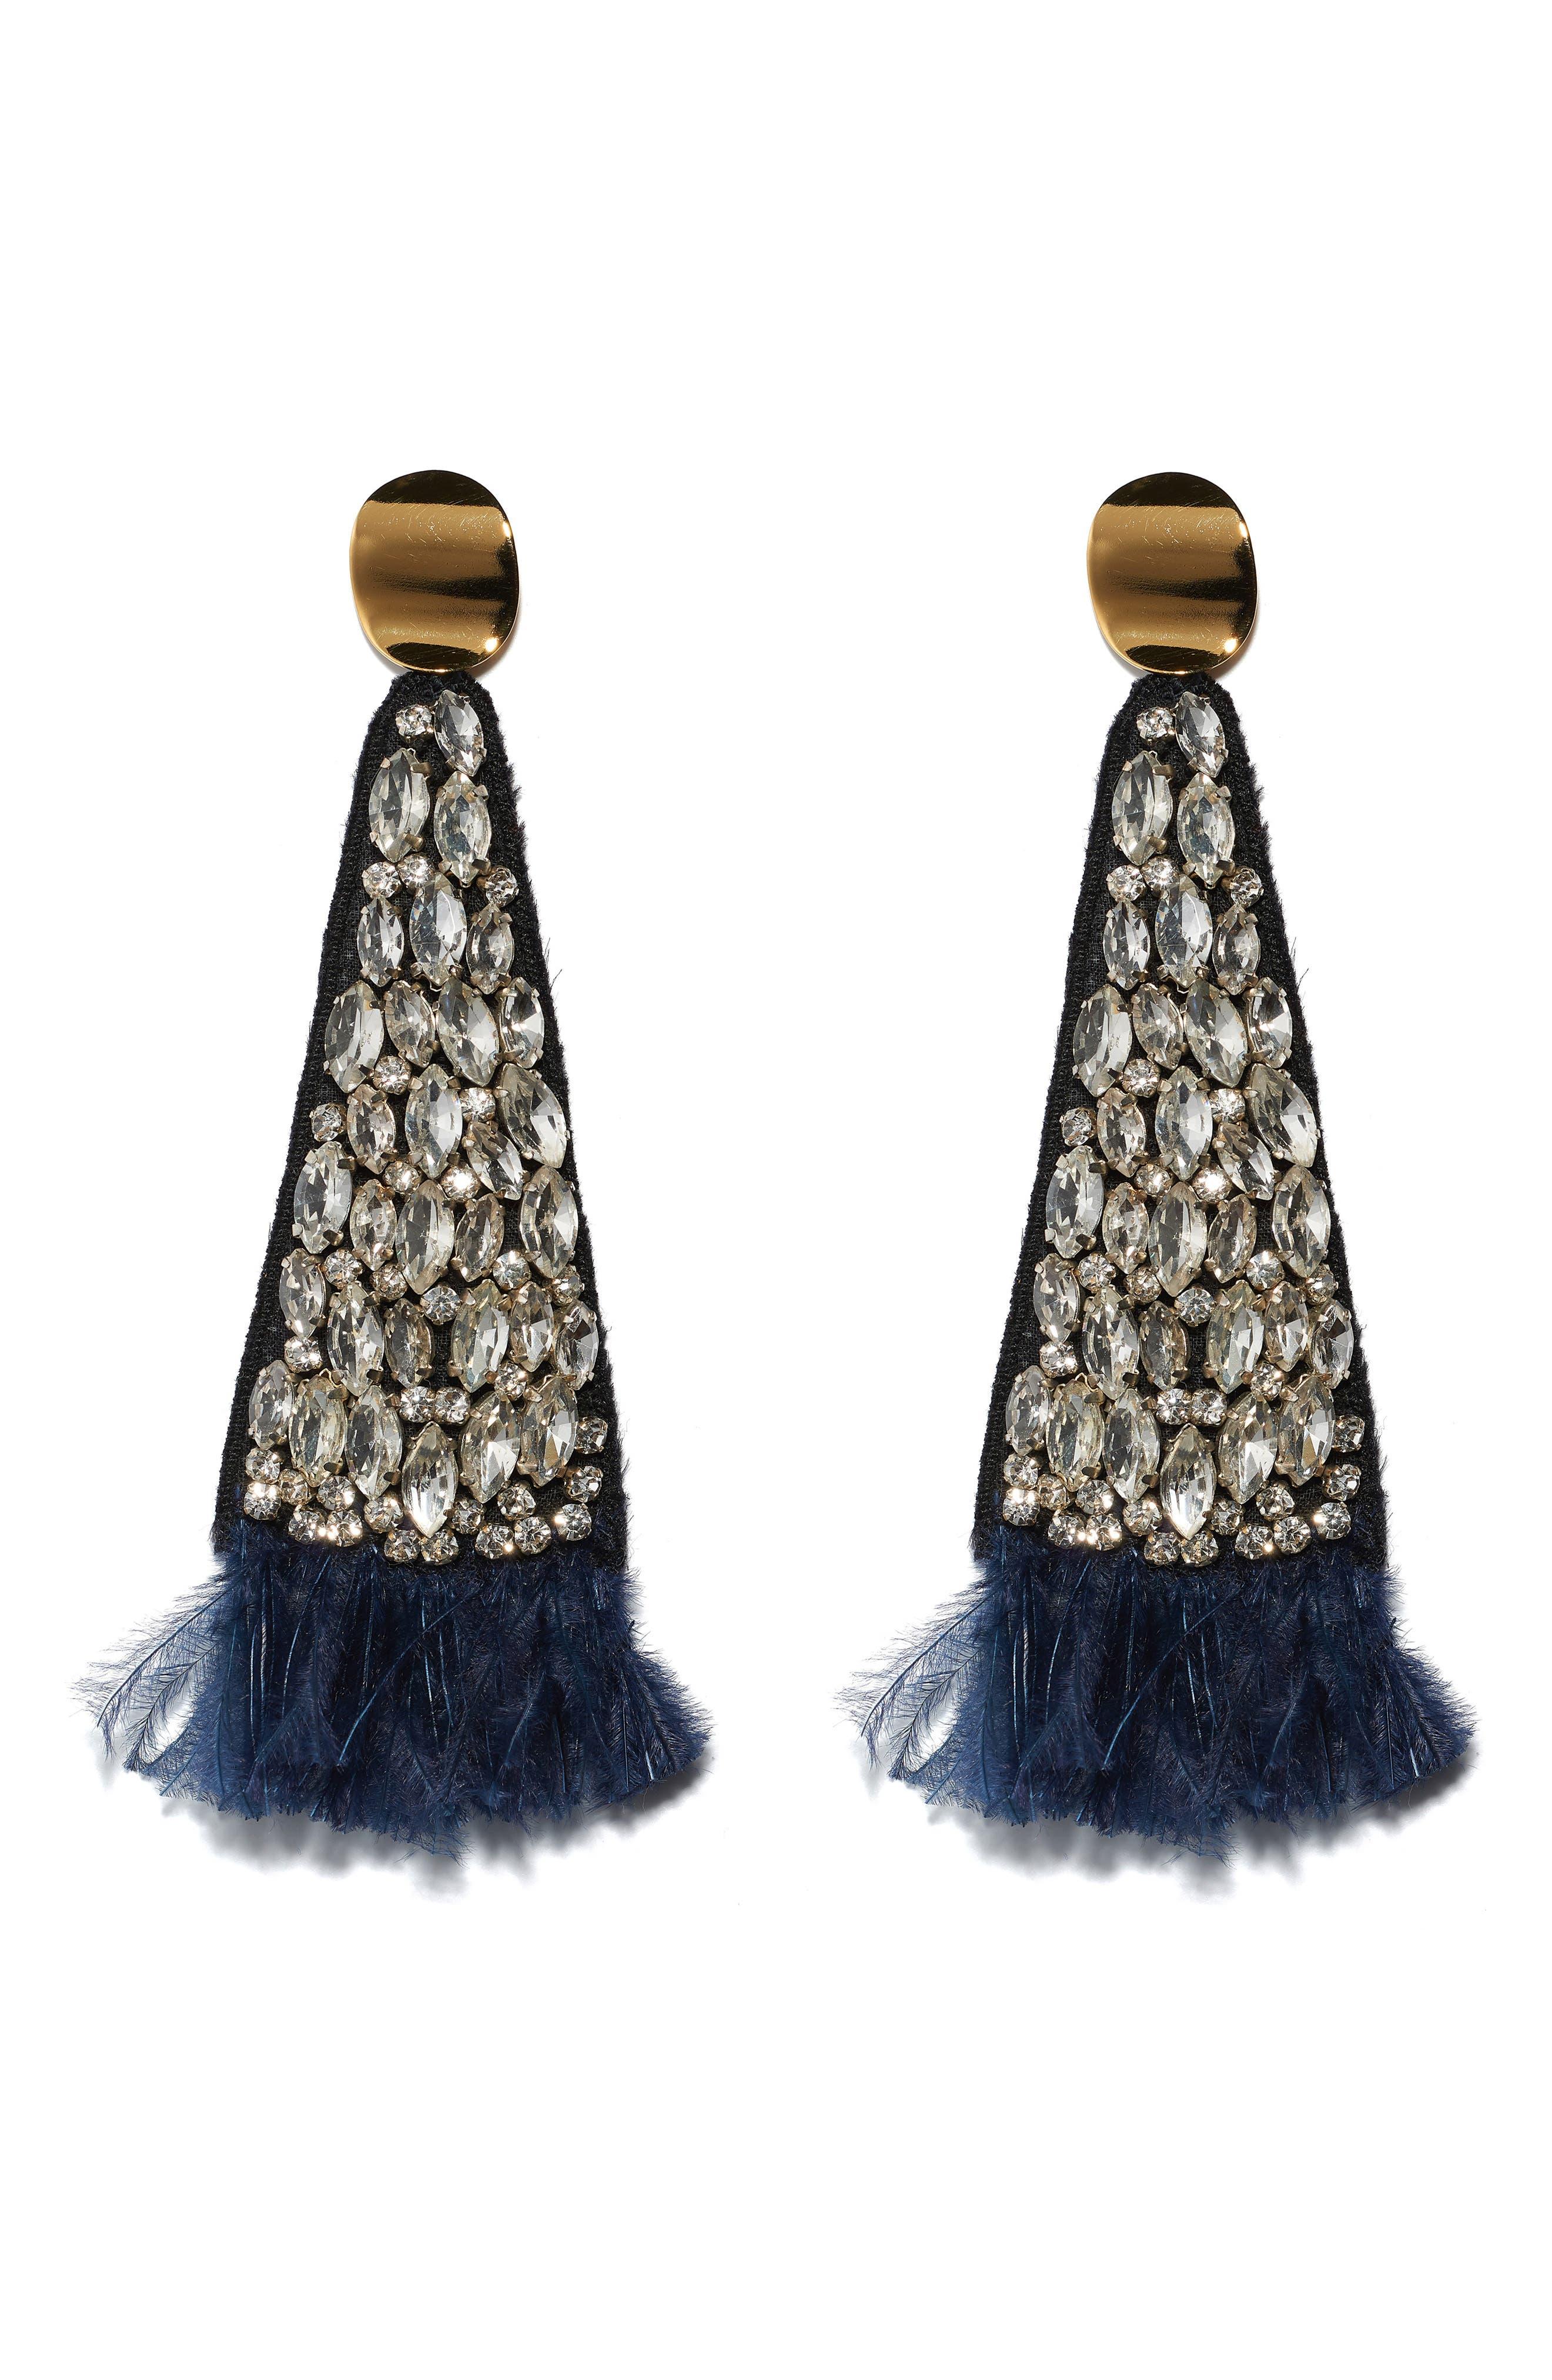 Crystal Fan Earrings,                             Main thumbnail 1, color,                             BLUE MULTI